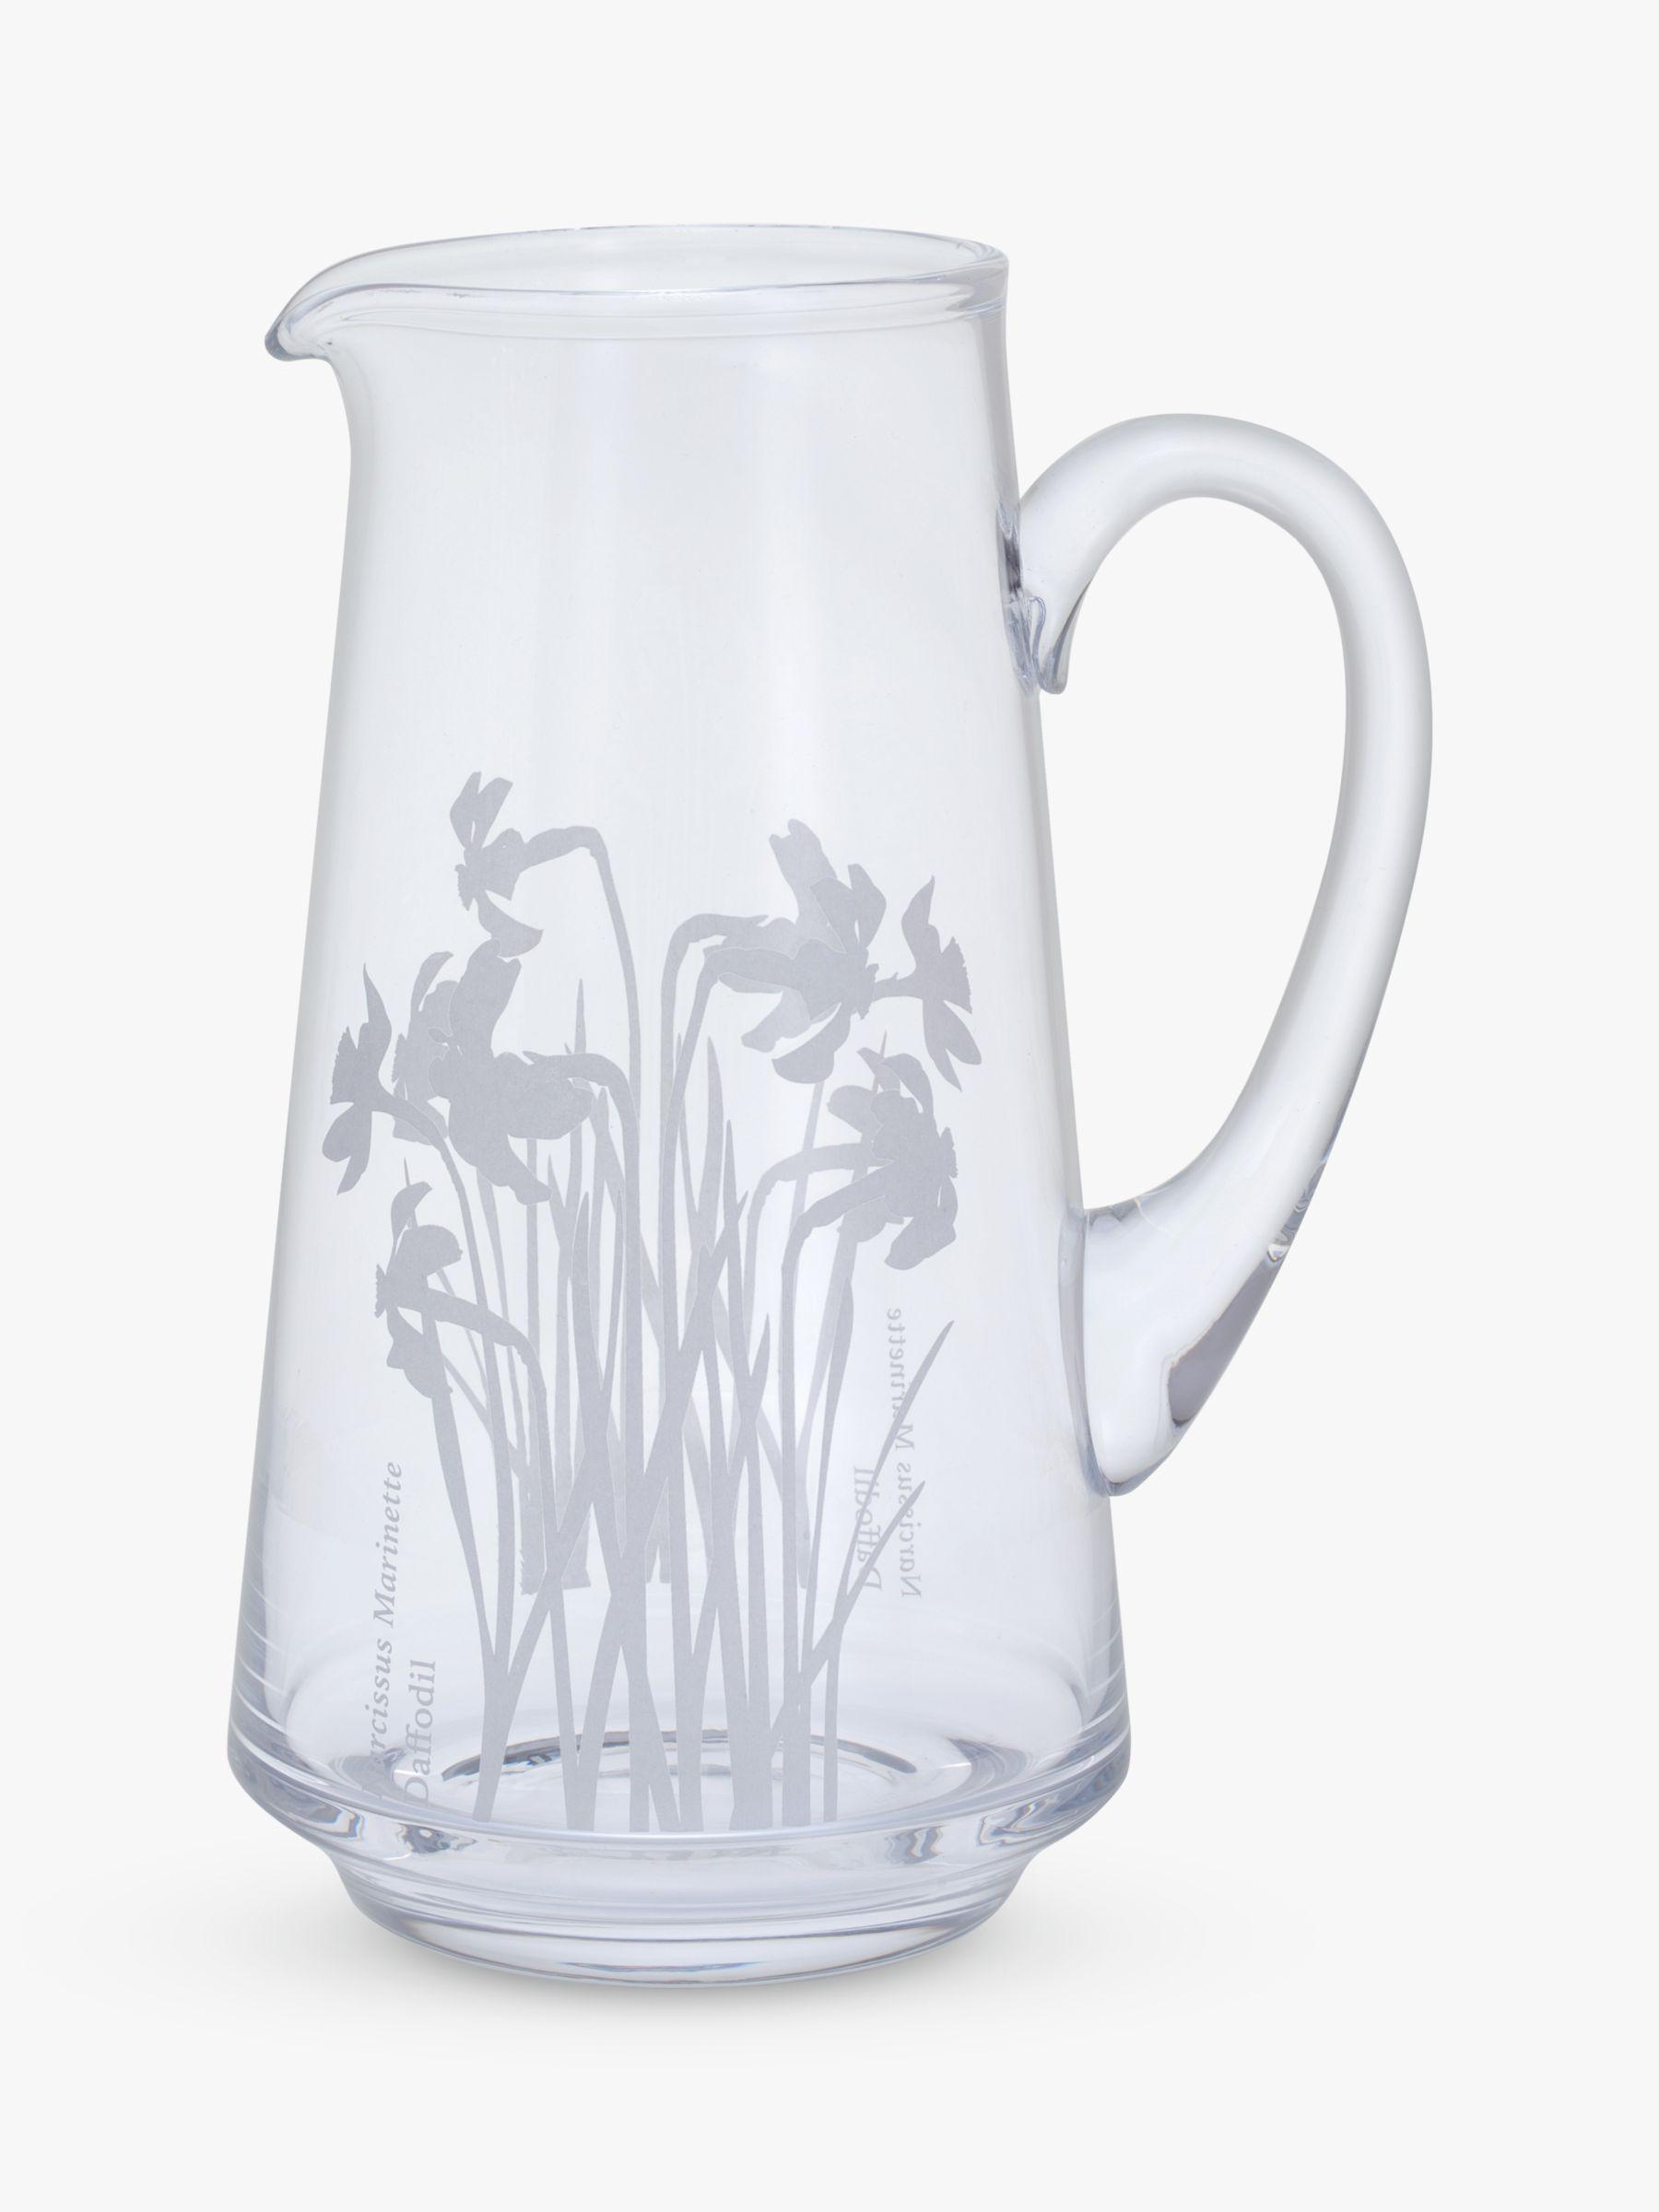 Dartington Crystal Dartington Crystal Bloom Daffodil Jug Vase, H22.5cm